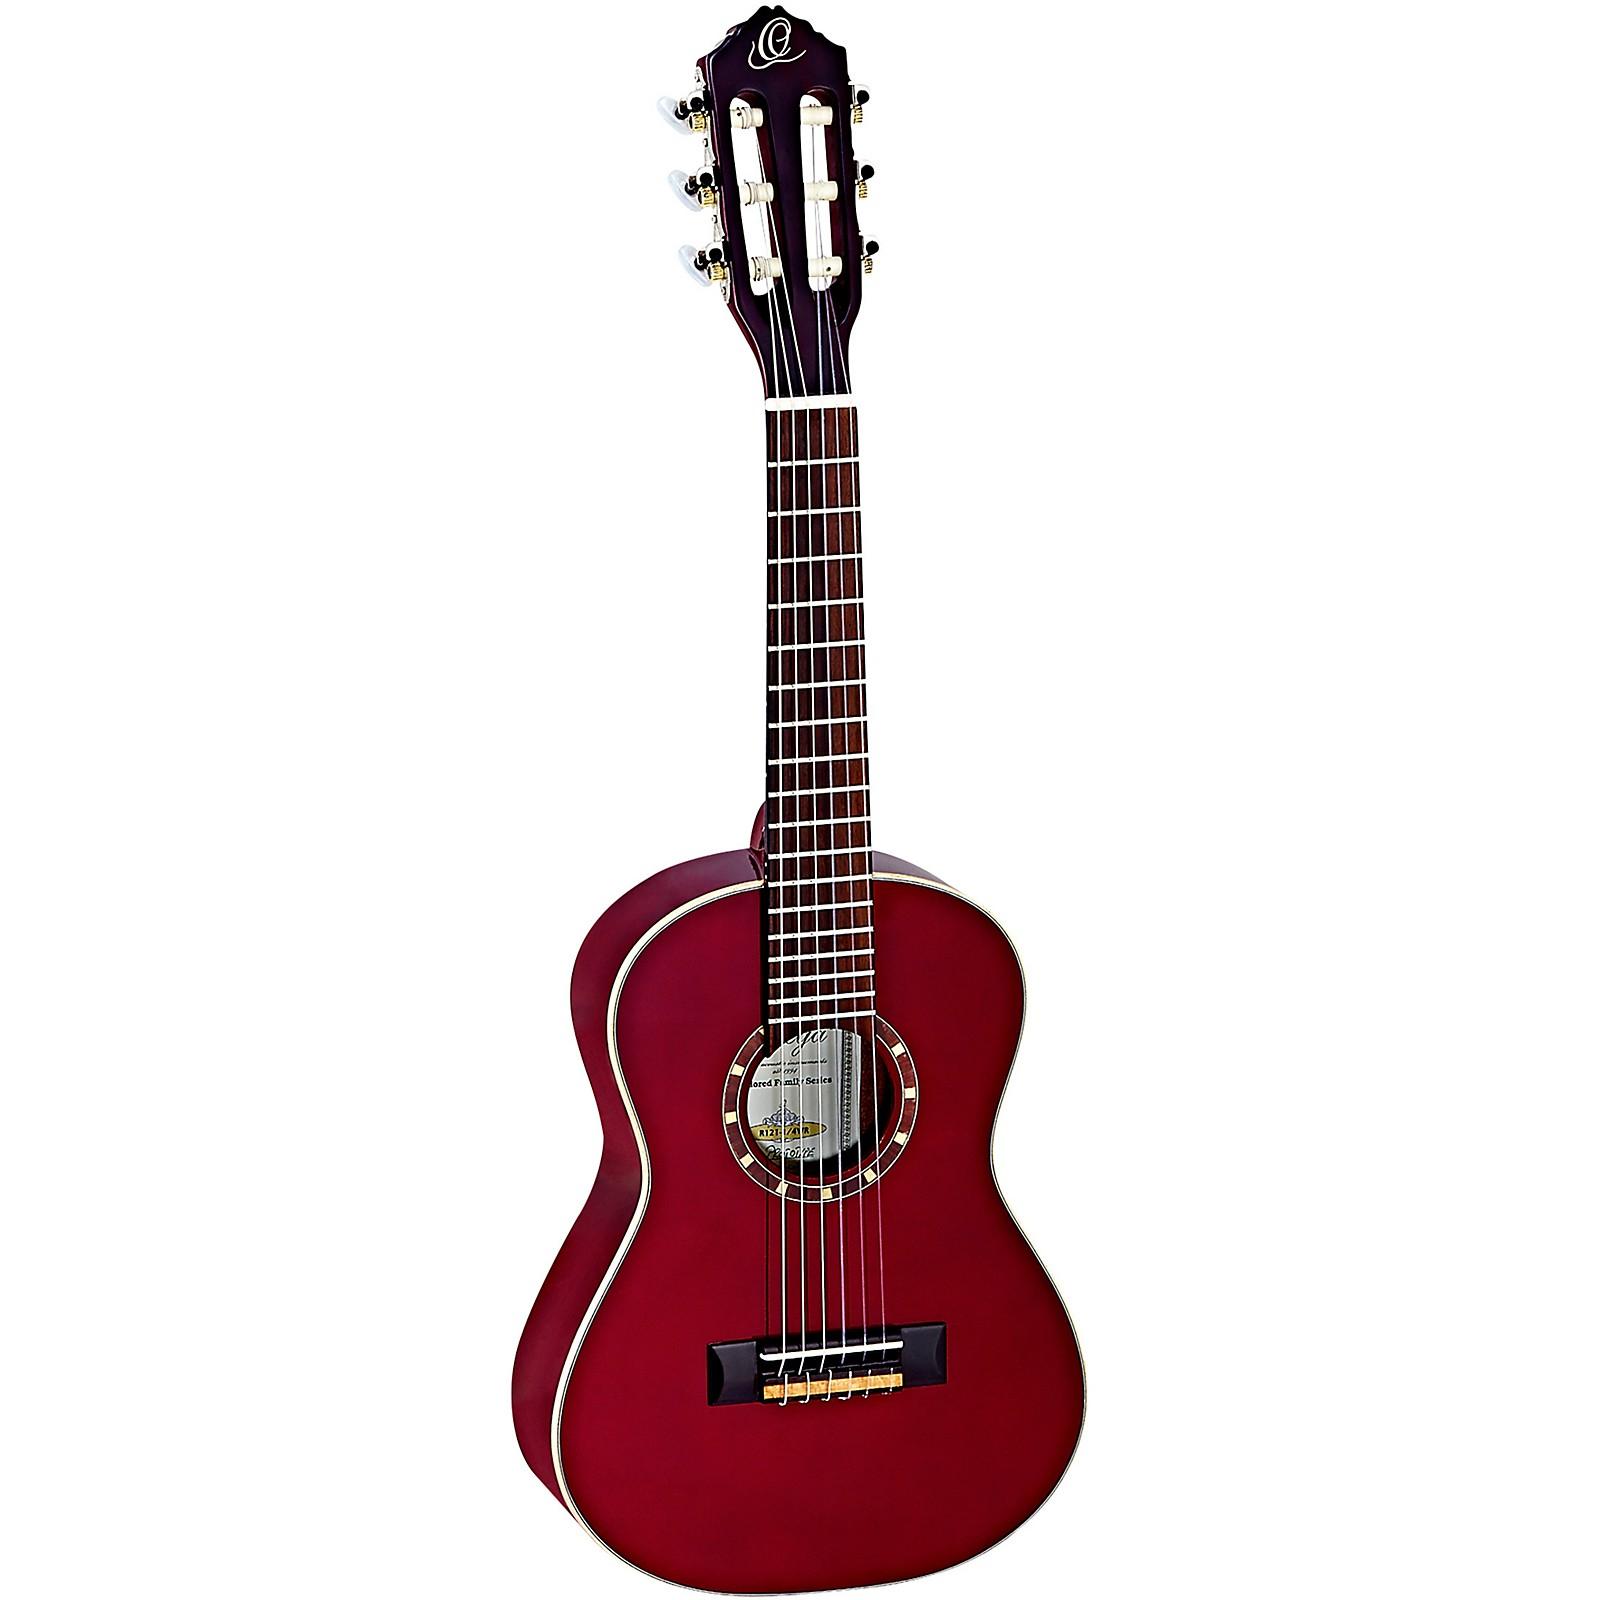 Ortega Family Series R121-1/4WR 1/4 Size Classical Guitar